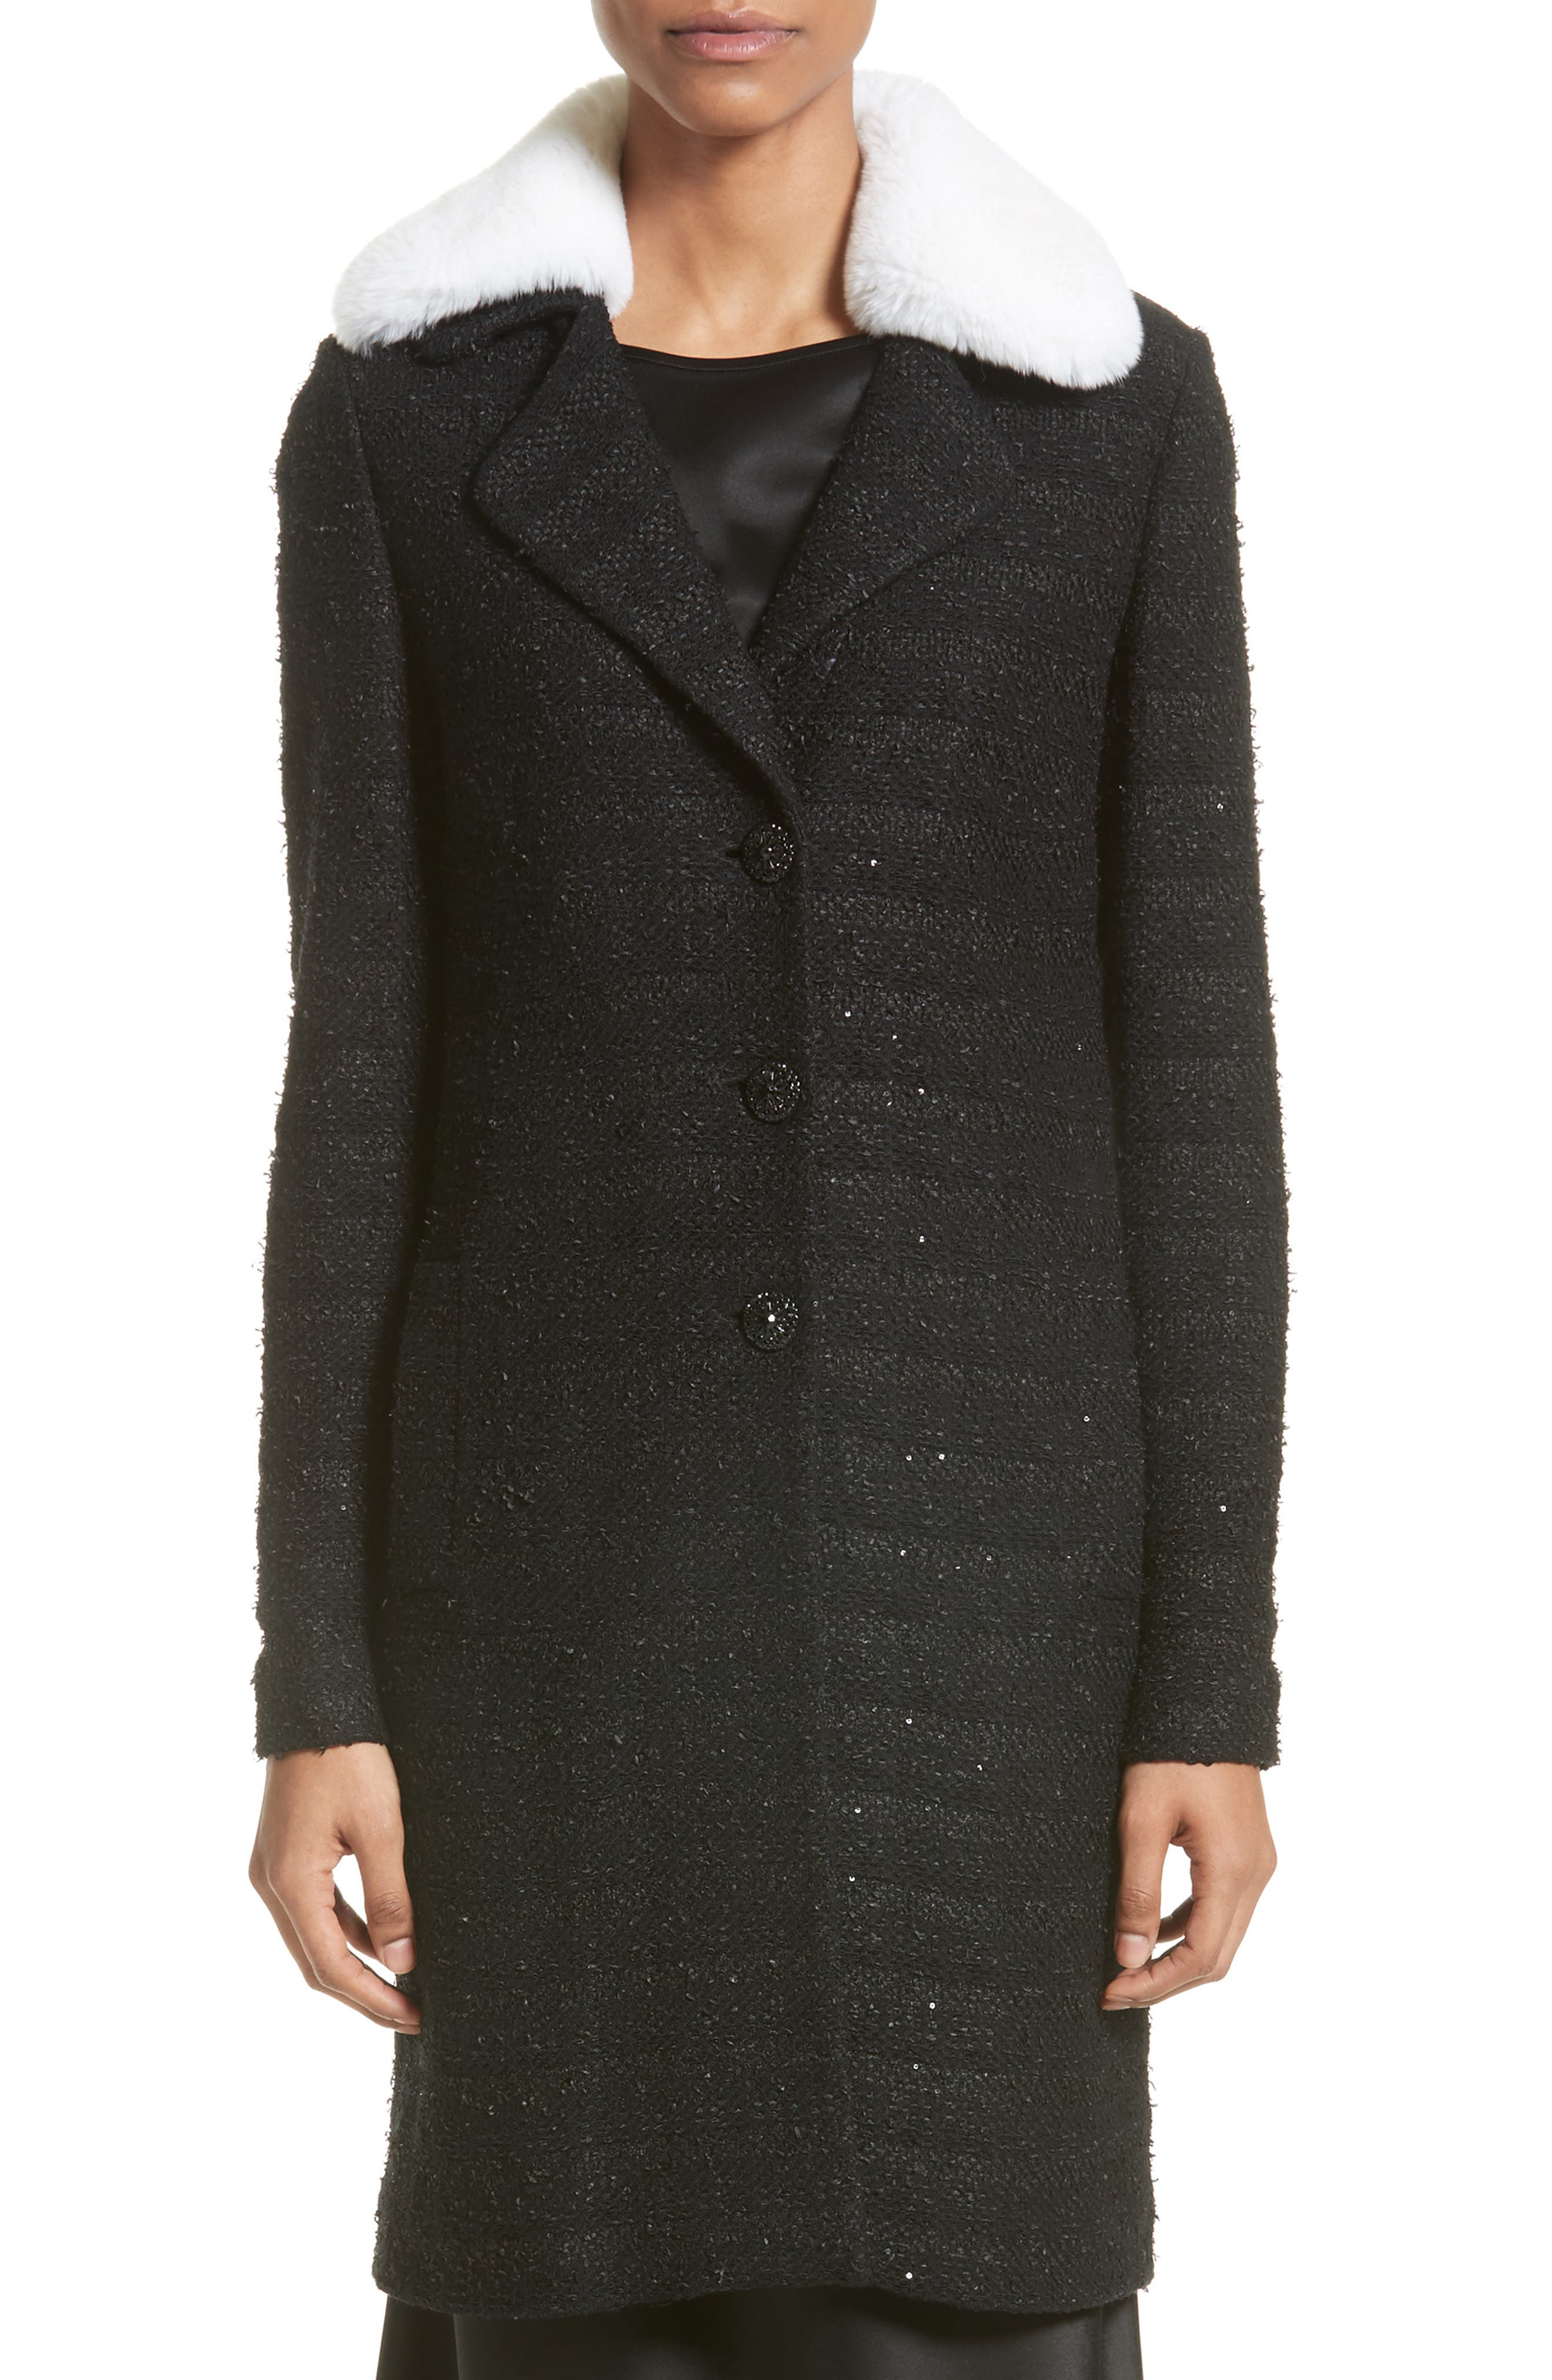 Sequin Knit Topper with Detachable Genuine Rabbit Fur Collar,                             Main thumbnail 1, color,                             001